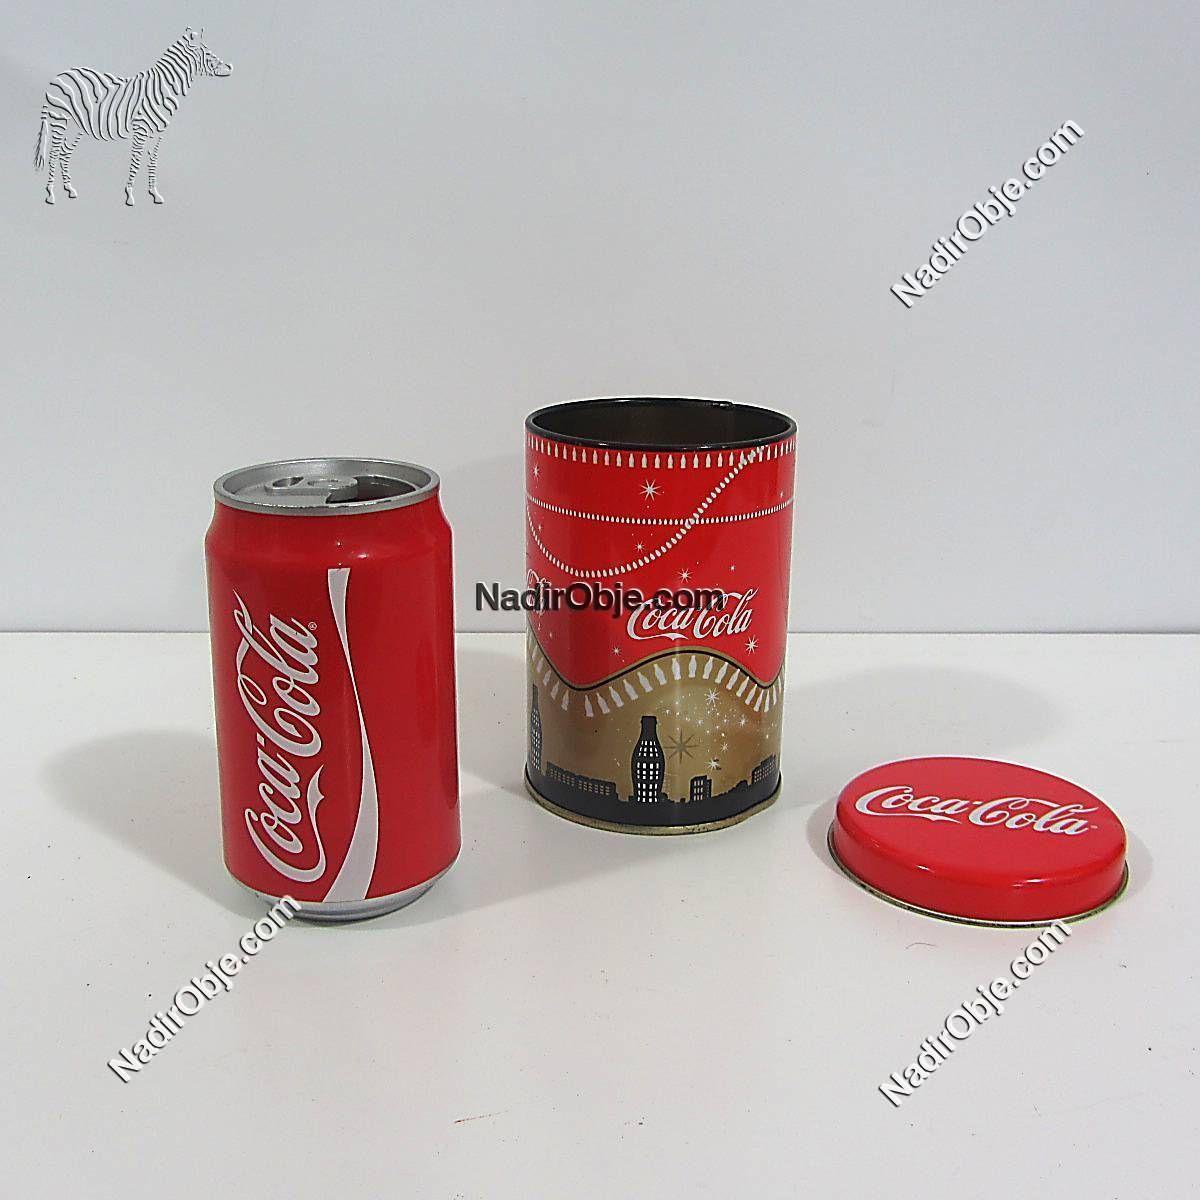 Coca Cola Hoparlör Mekanik-Elektrikli Objeler Coca Cola